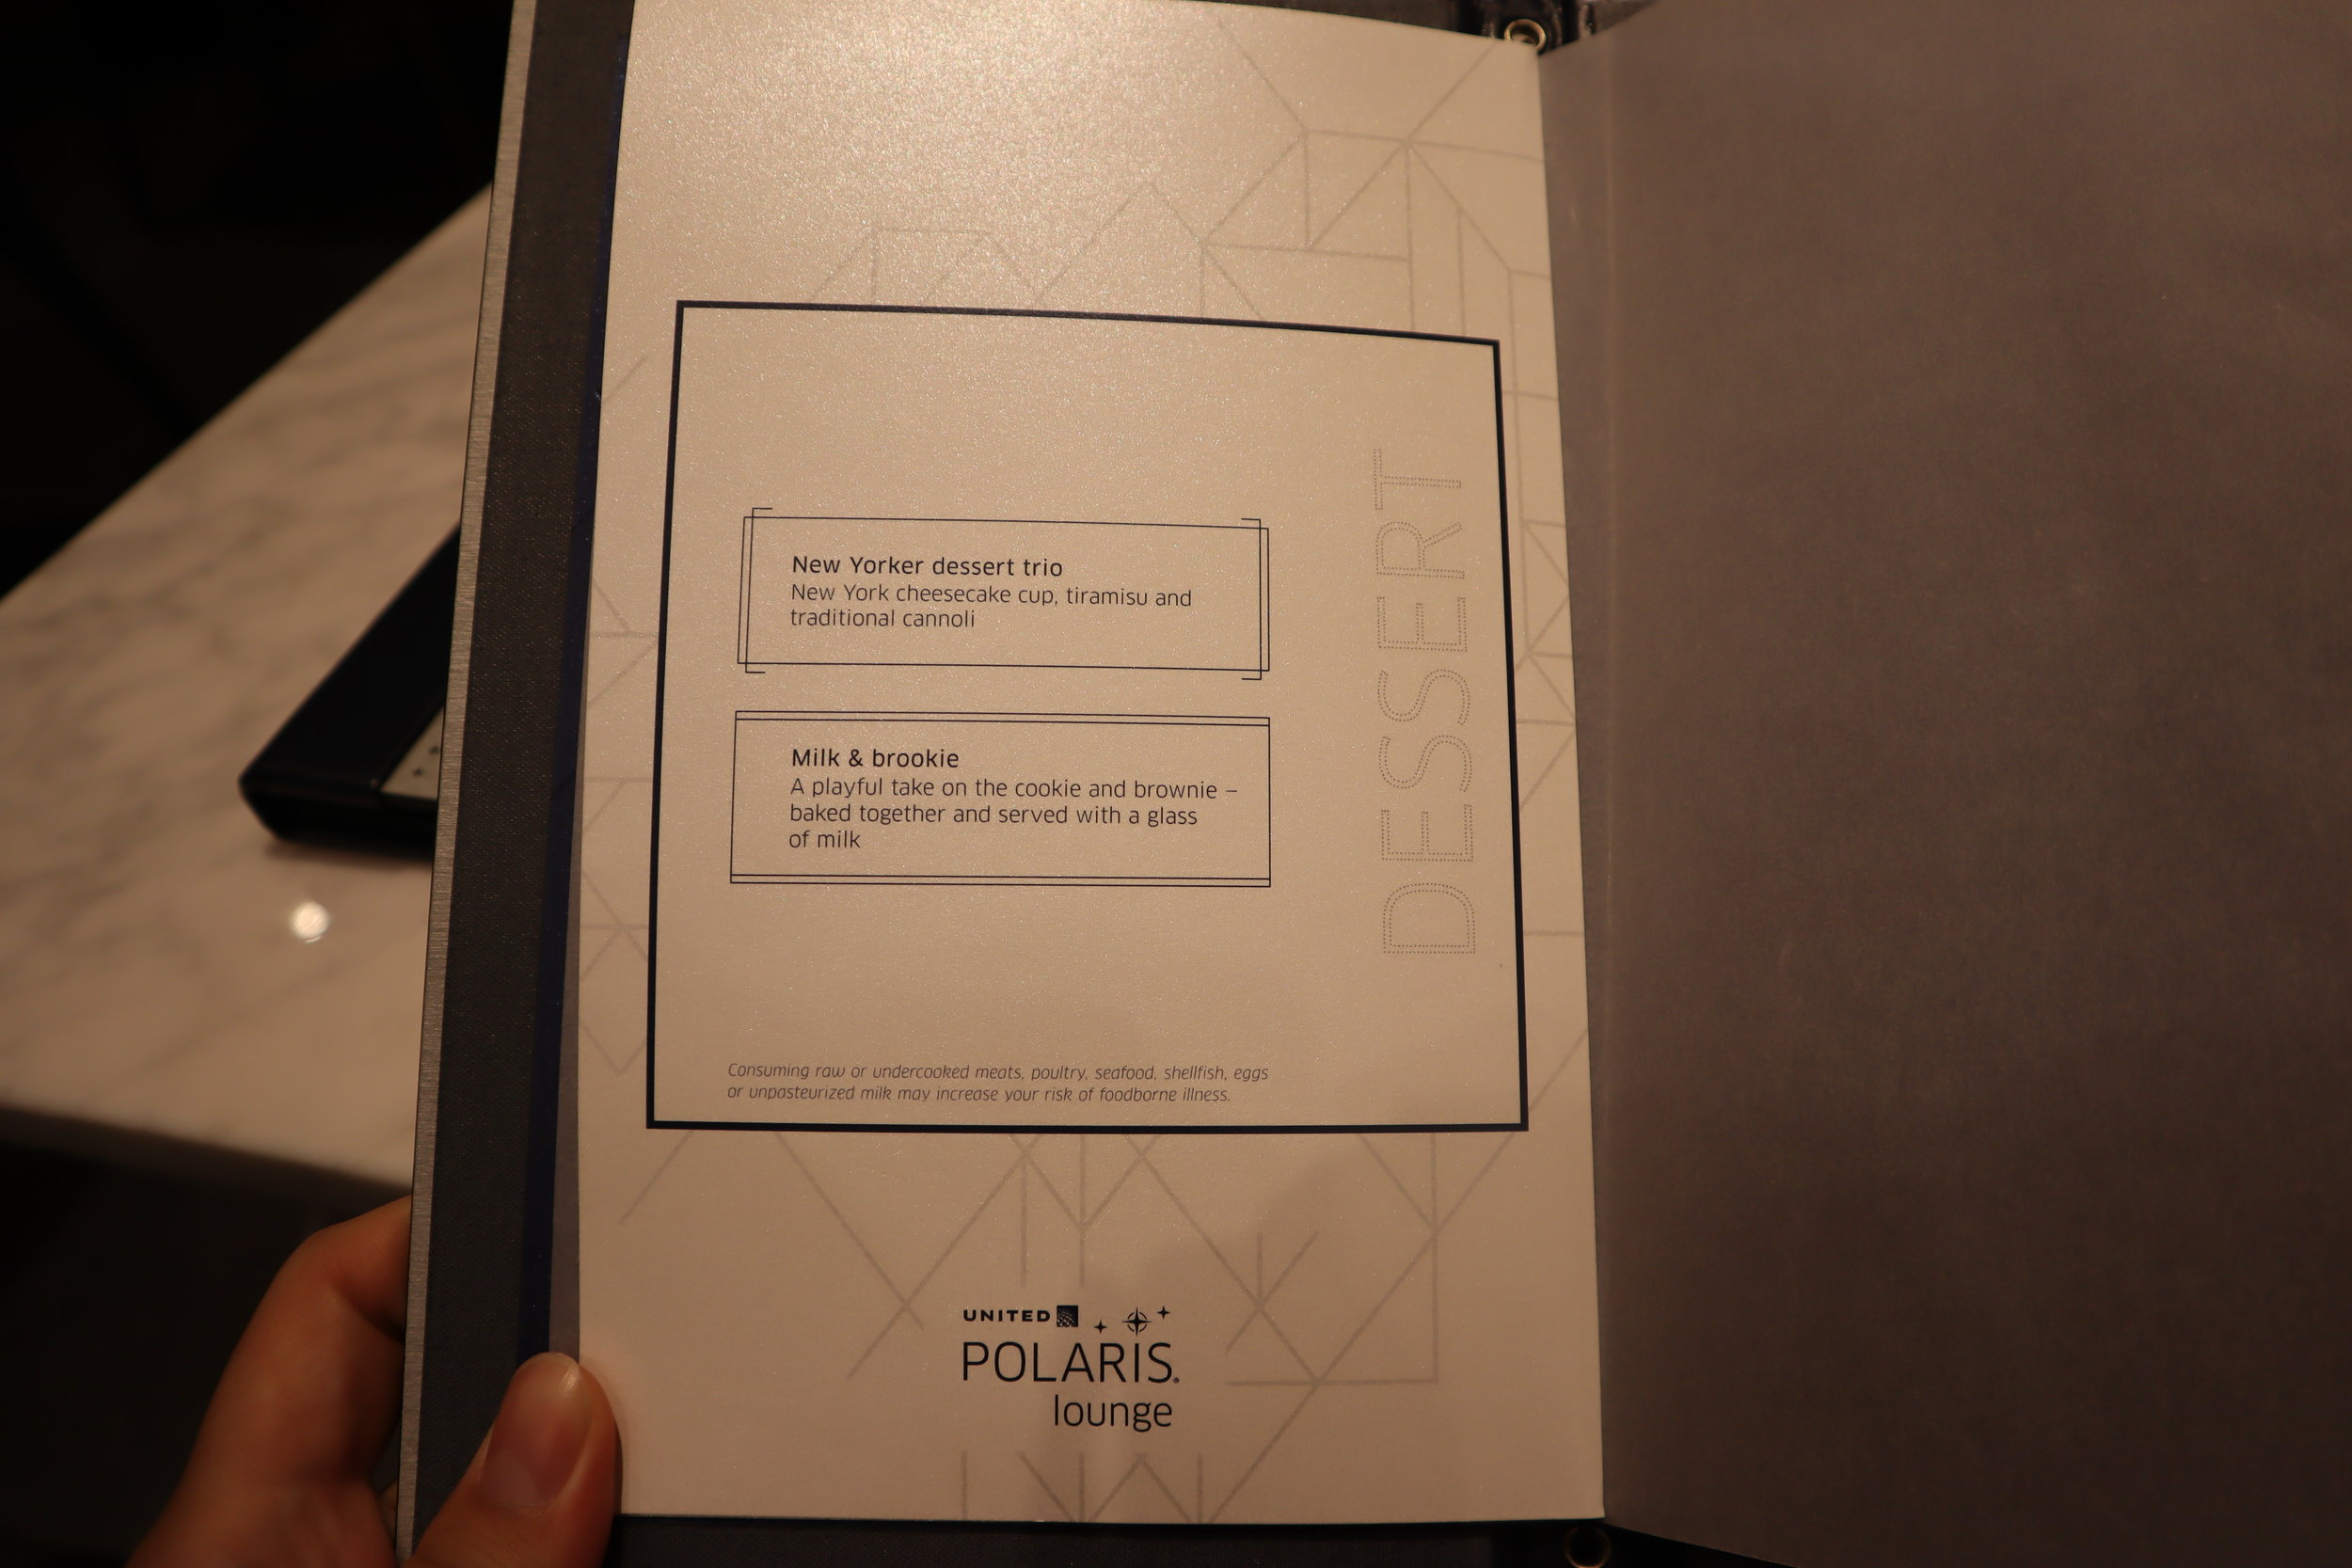 United Polaris Lounge Newark – Menu